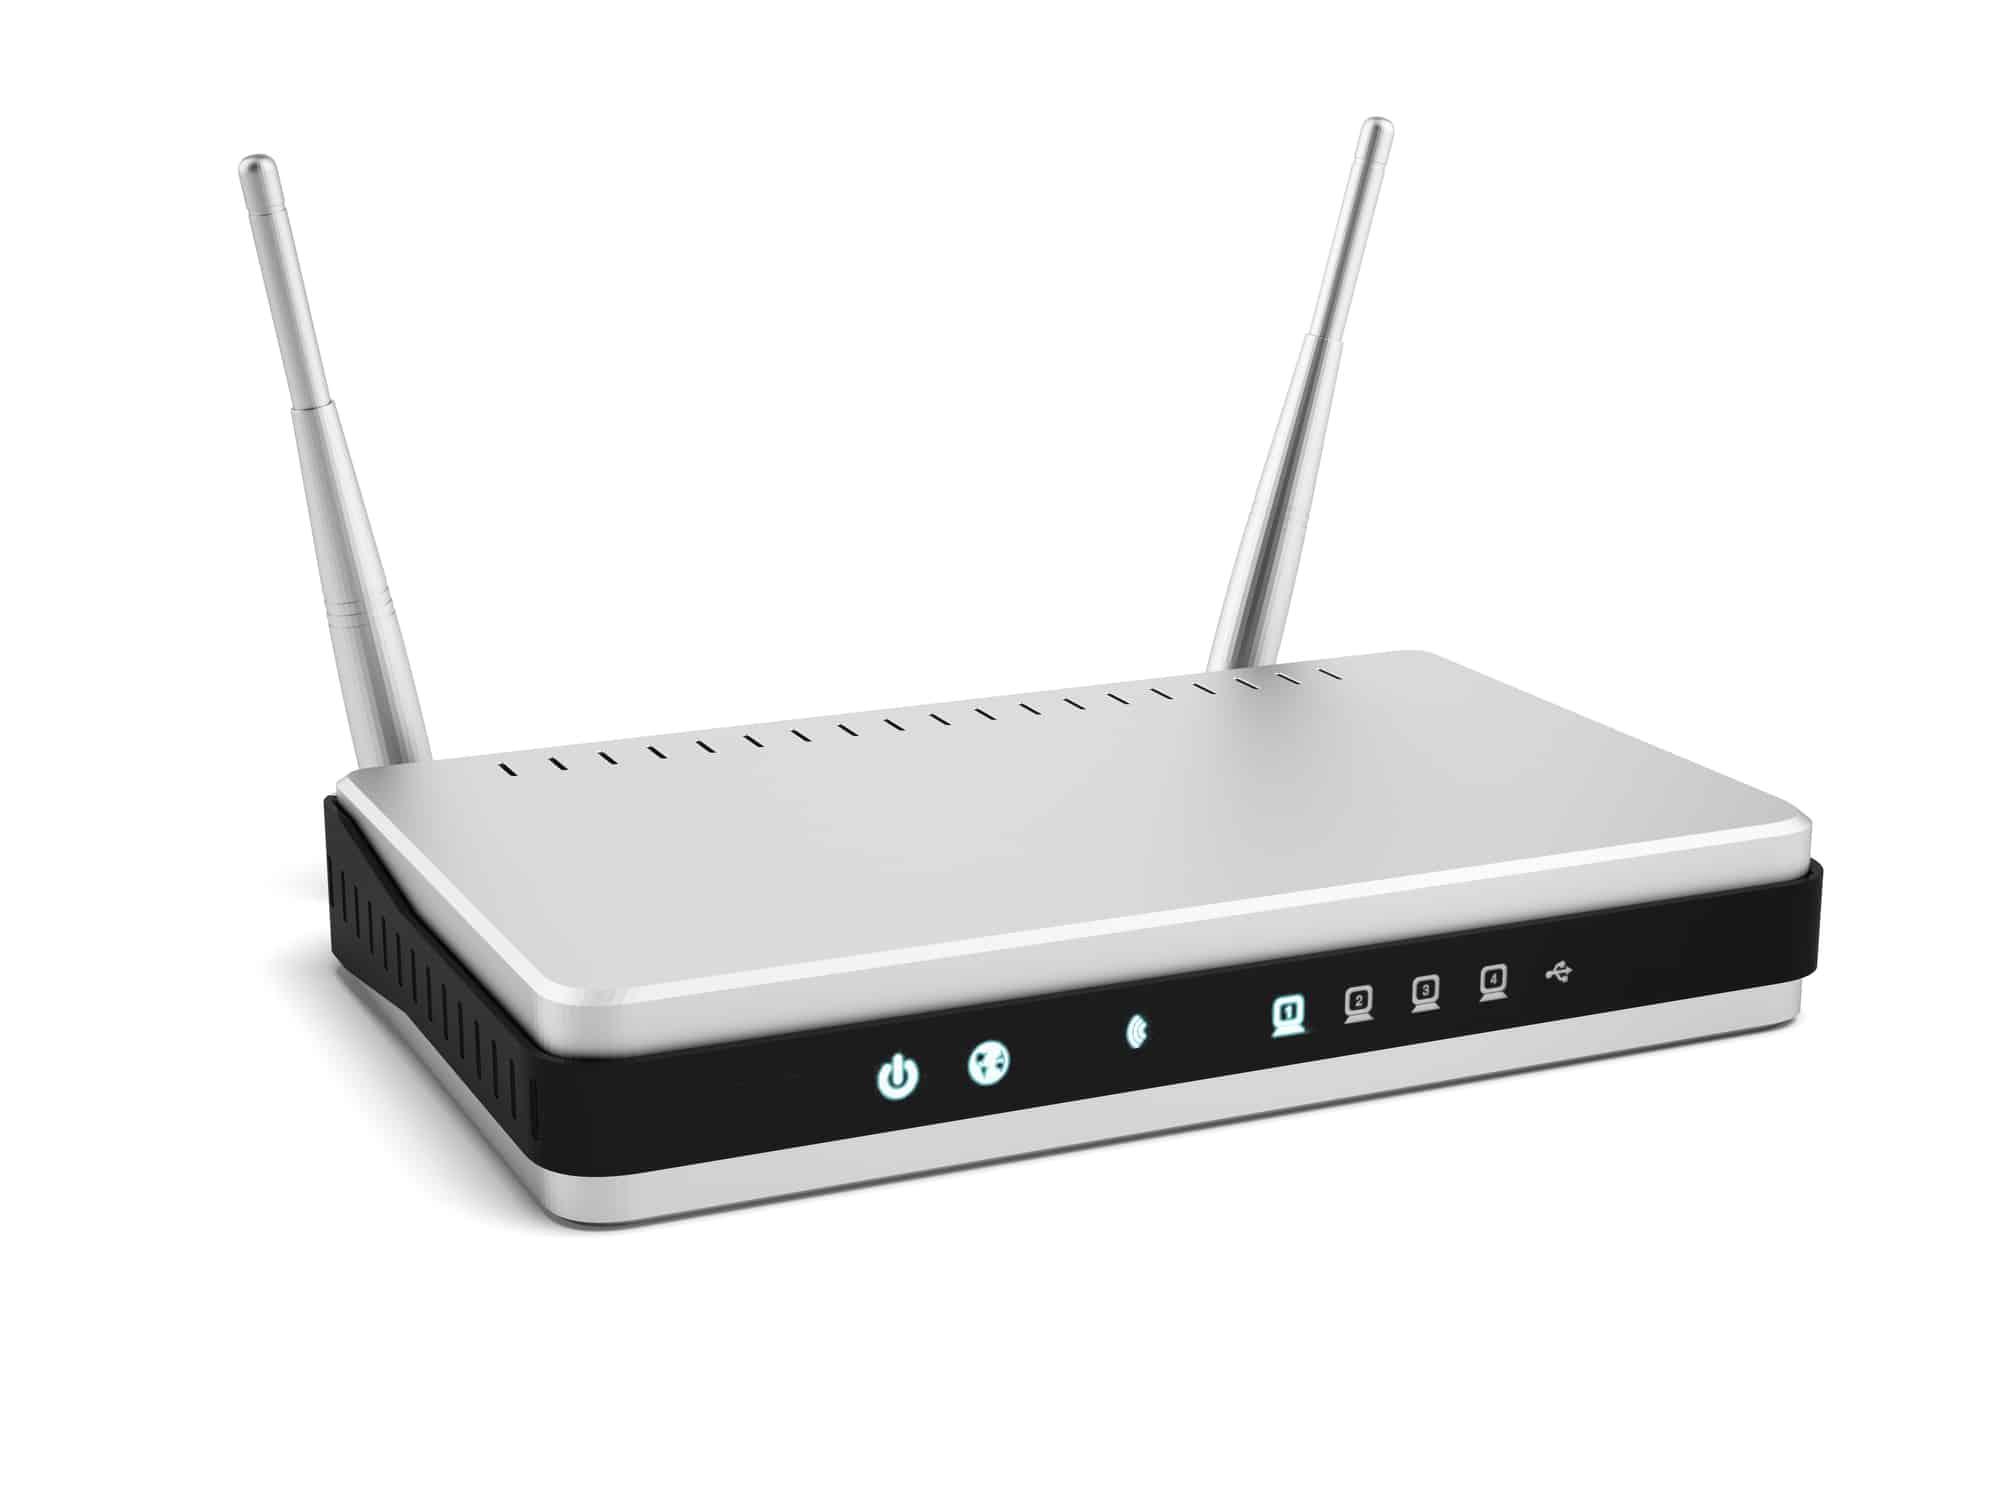 Linksys Velop Vs Netgear Orbi Tested Wifi Mesh System